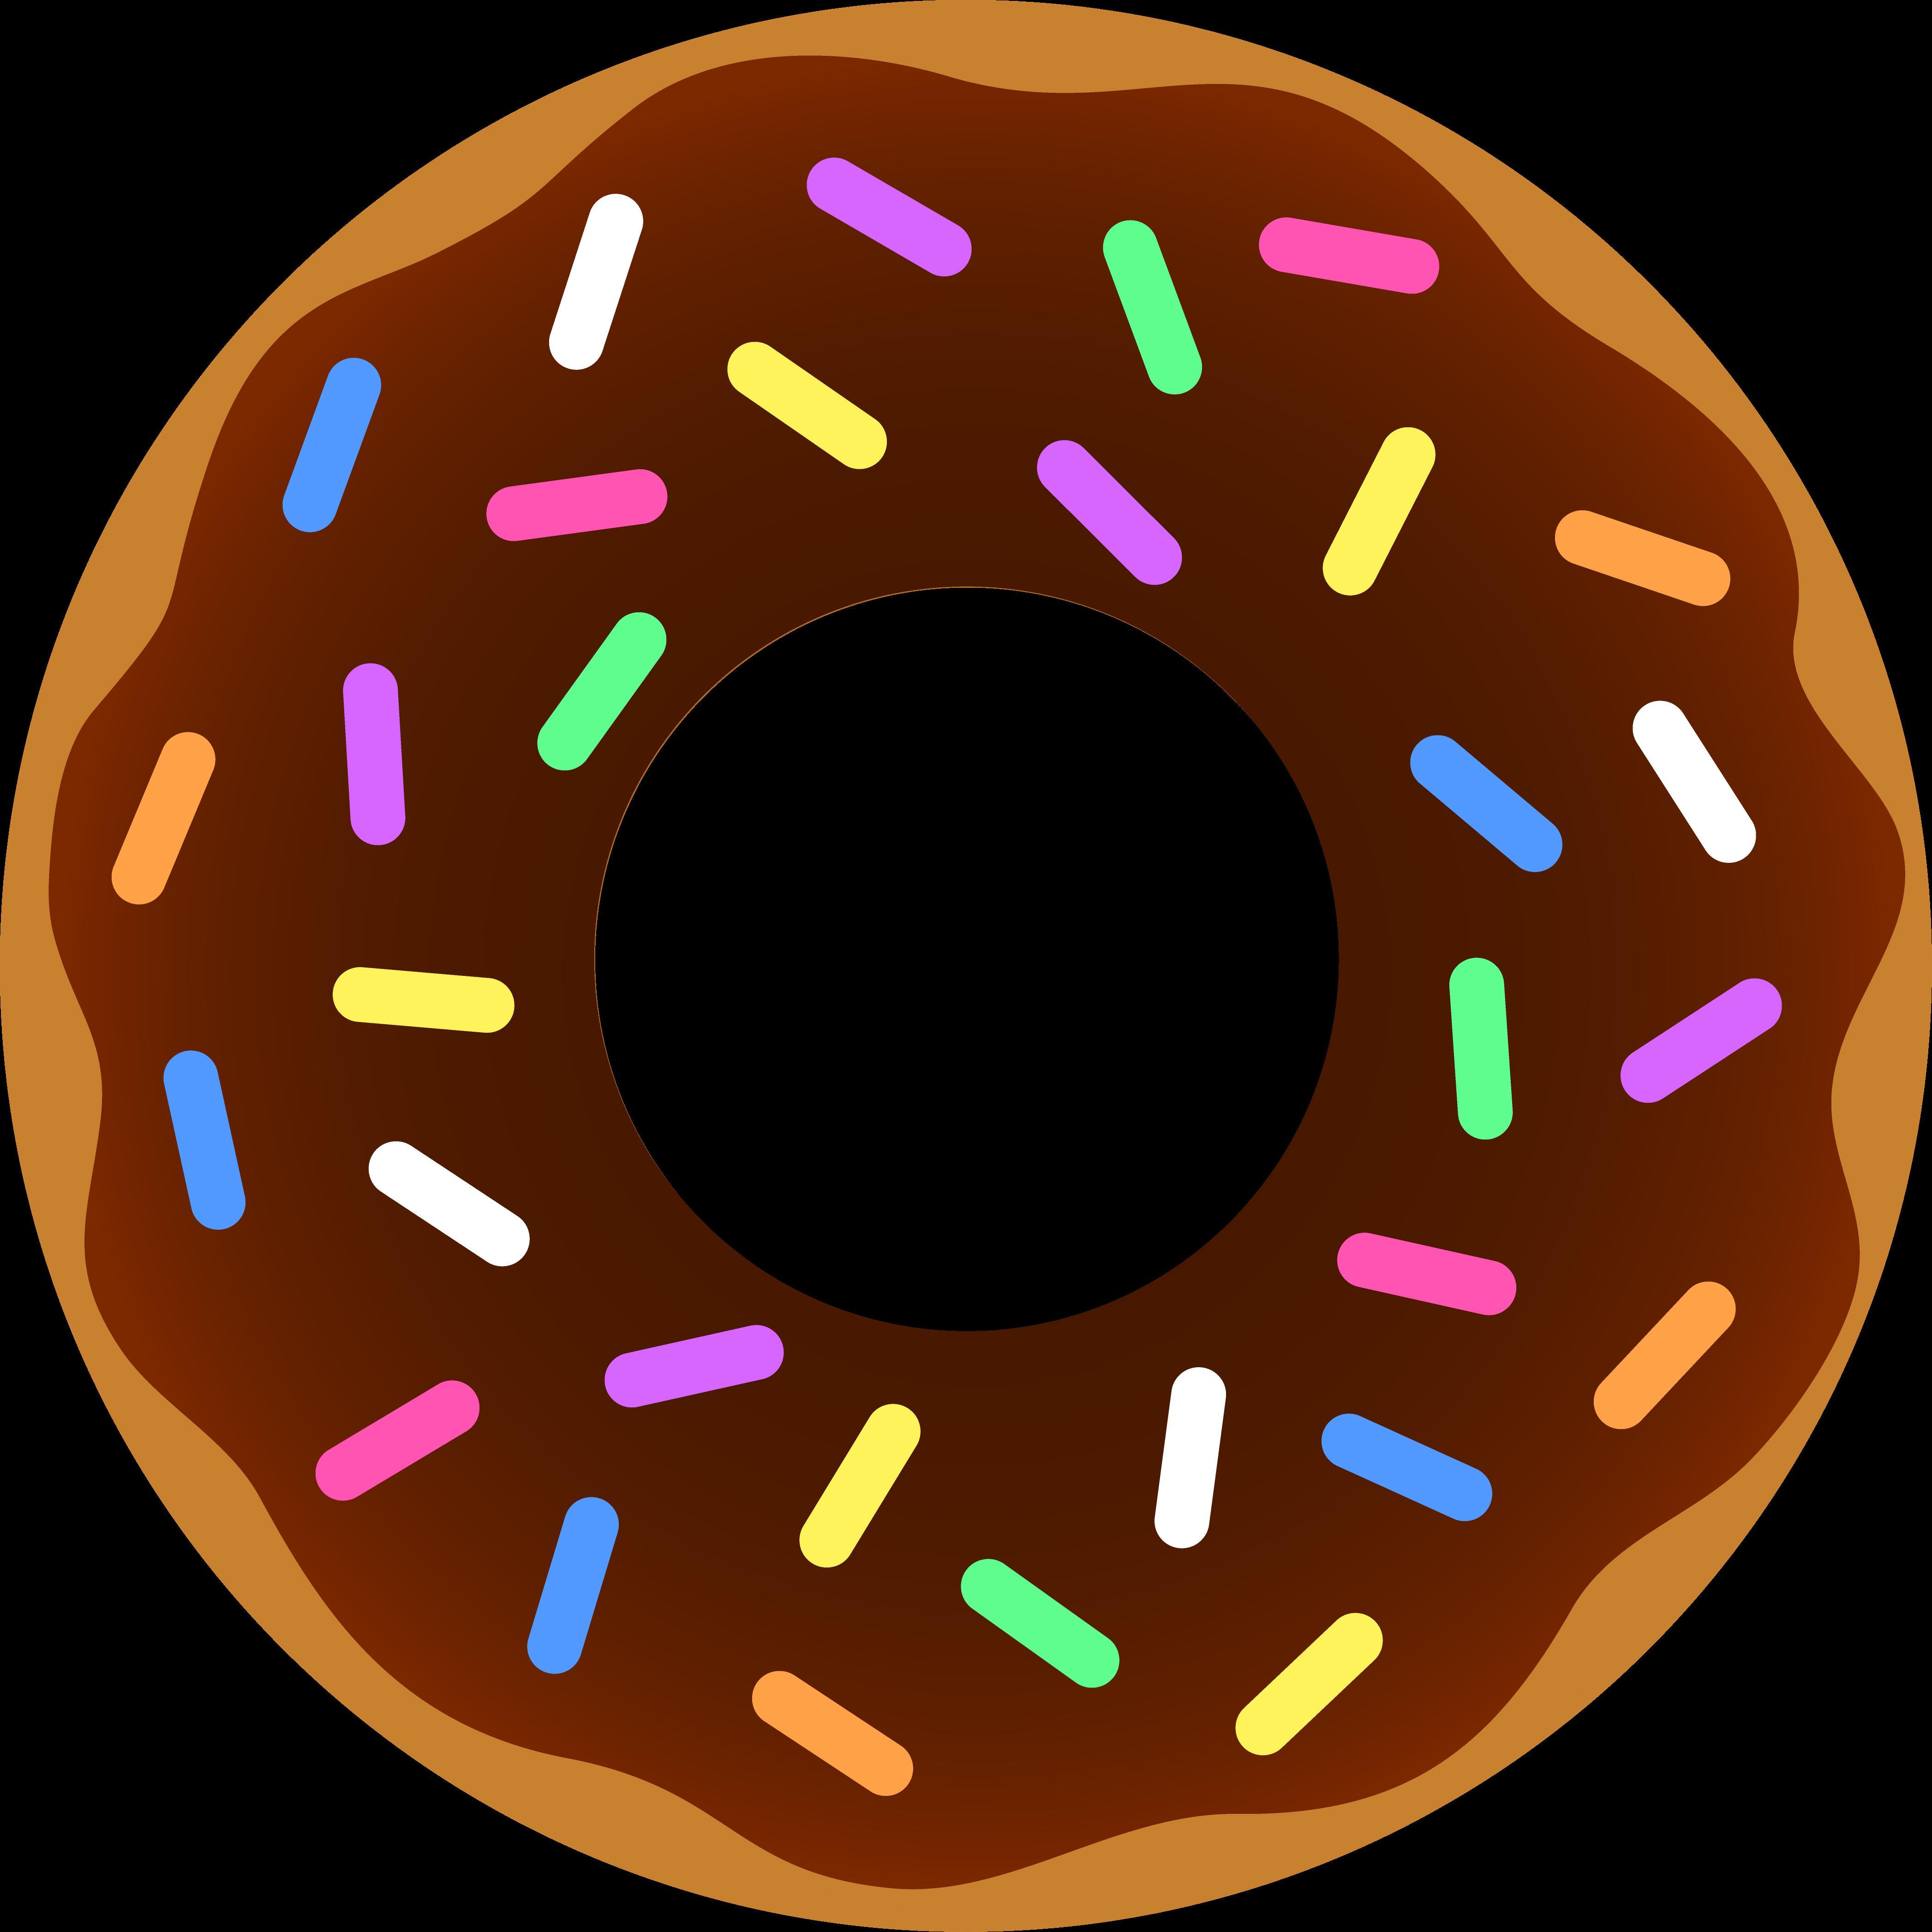 Collection of free dozens. Donuts clipart dozen